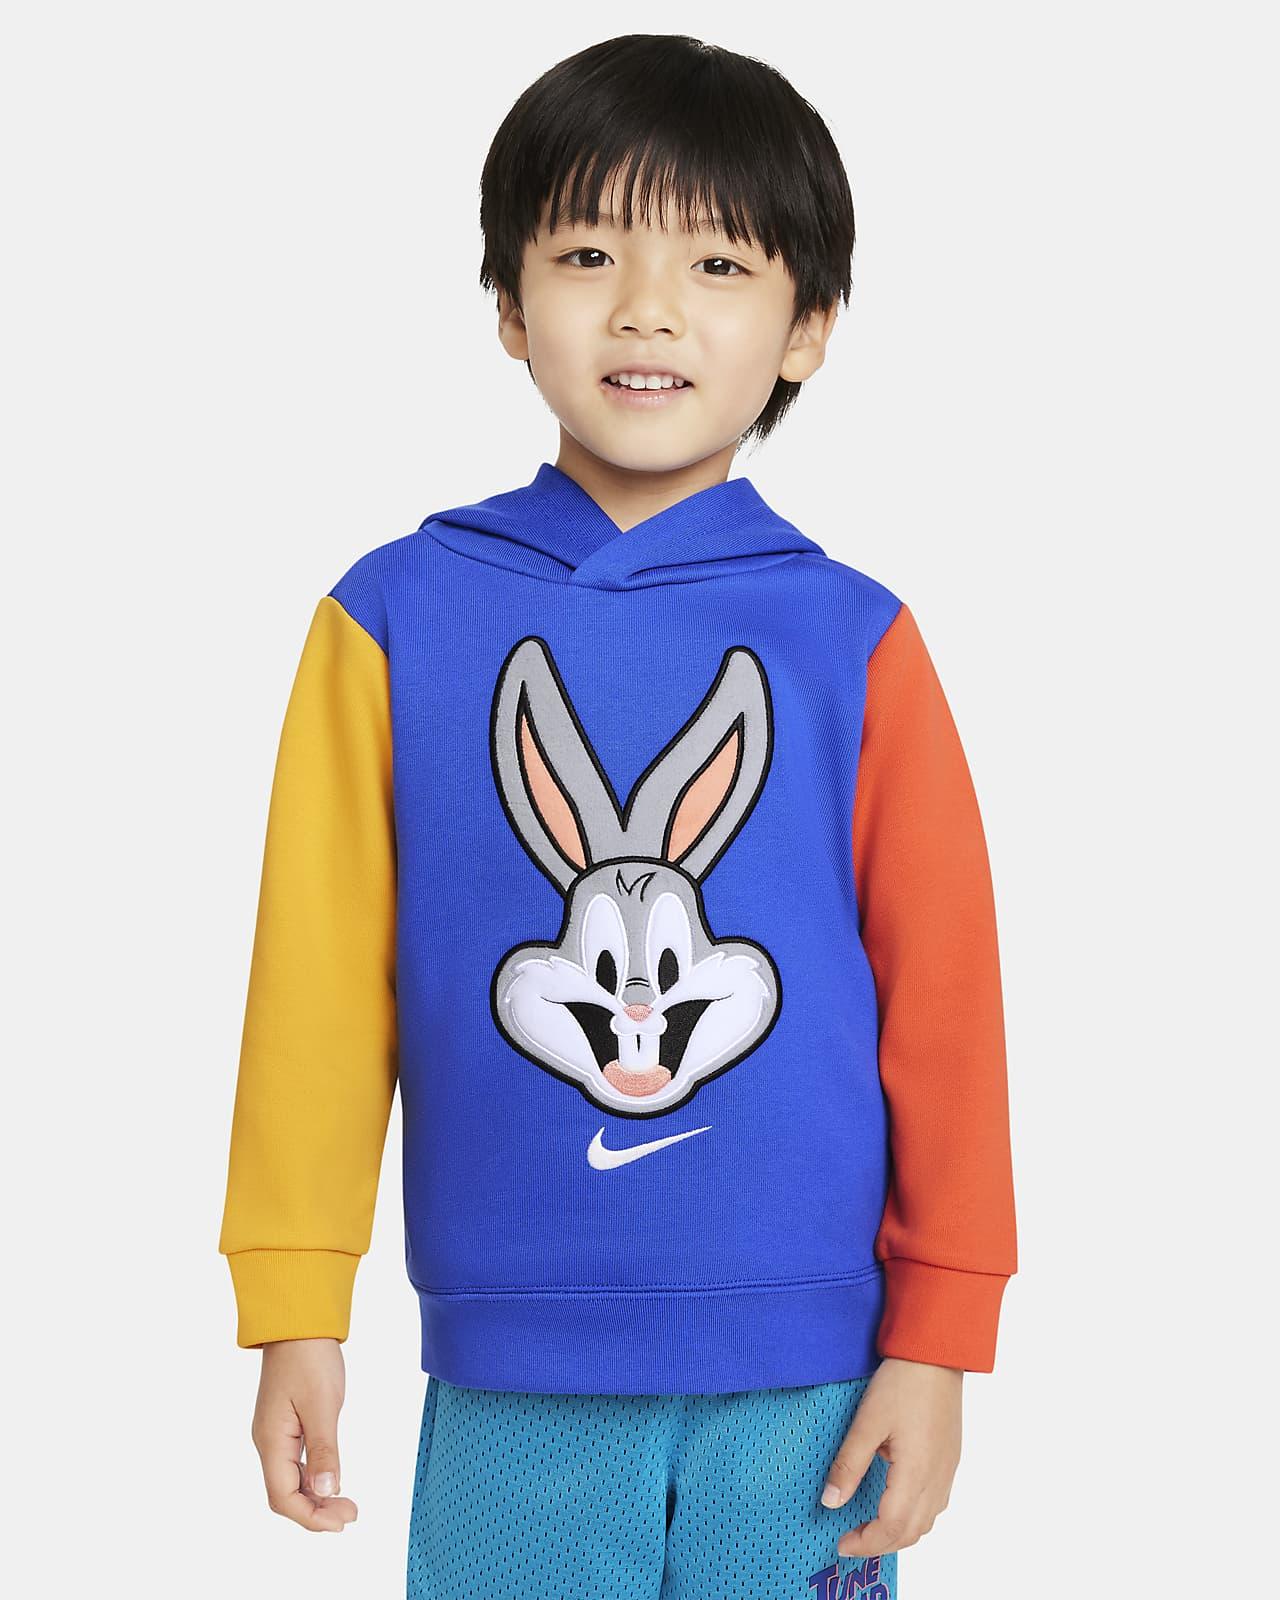 Nike Dri-FIT 婴童套头连帽衫